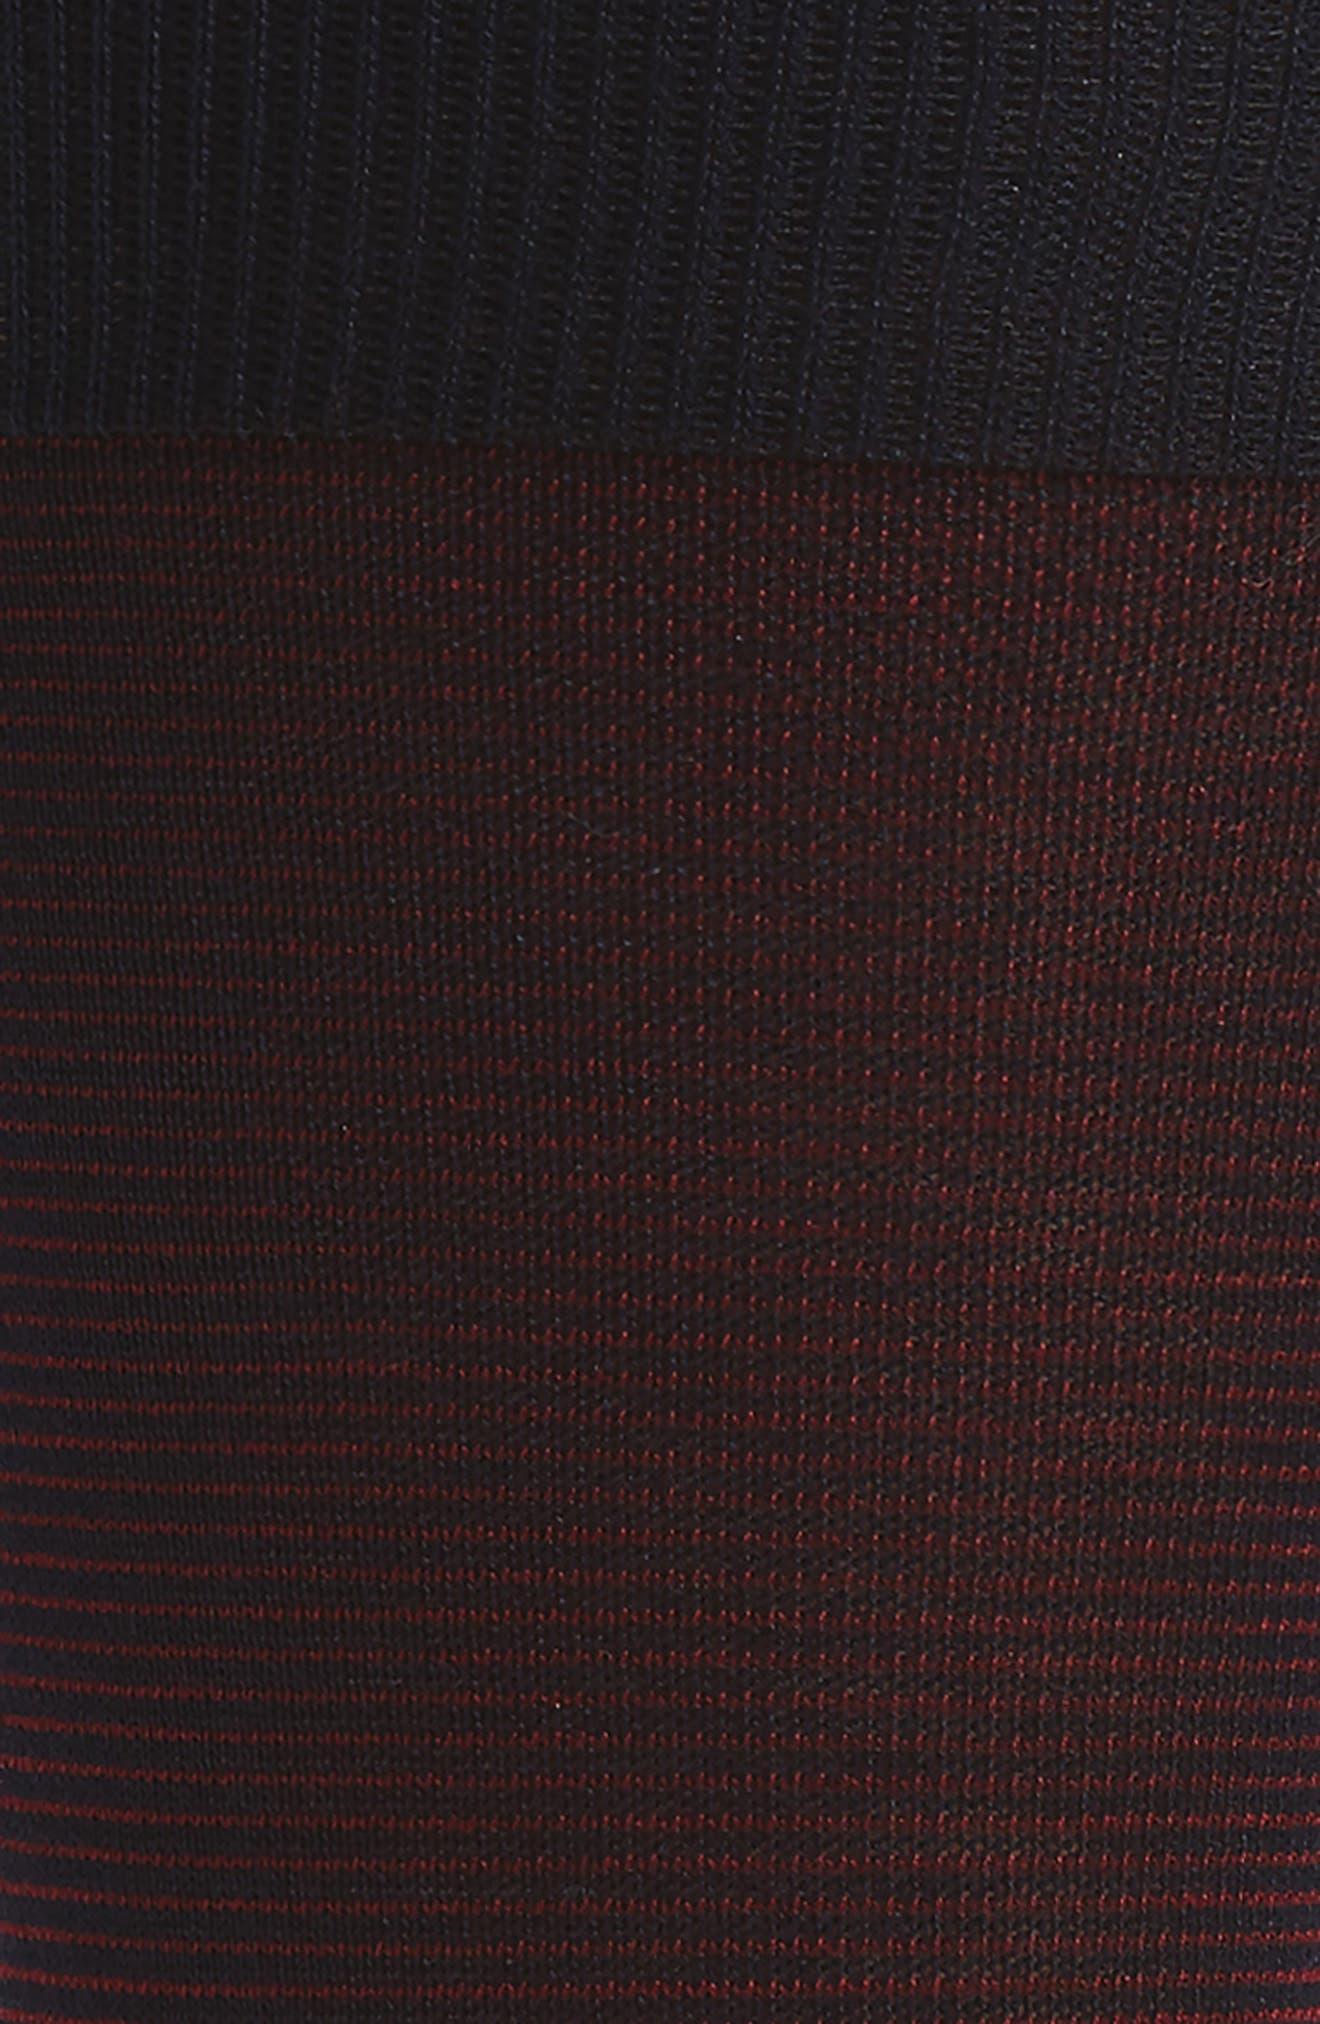 Microstripe Socks,                             Alternate thumbnail 2, color,                             Navy